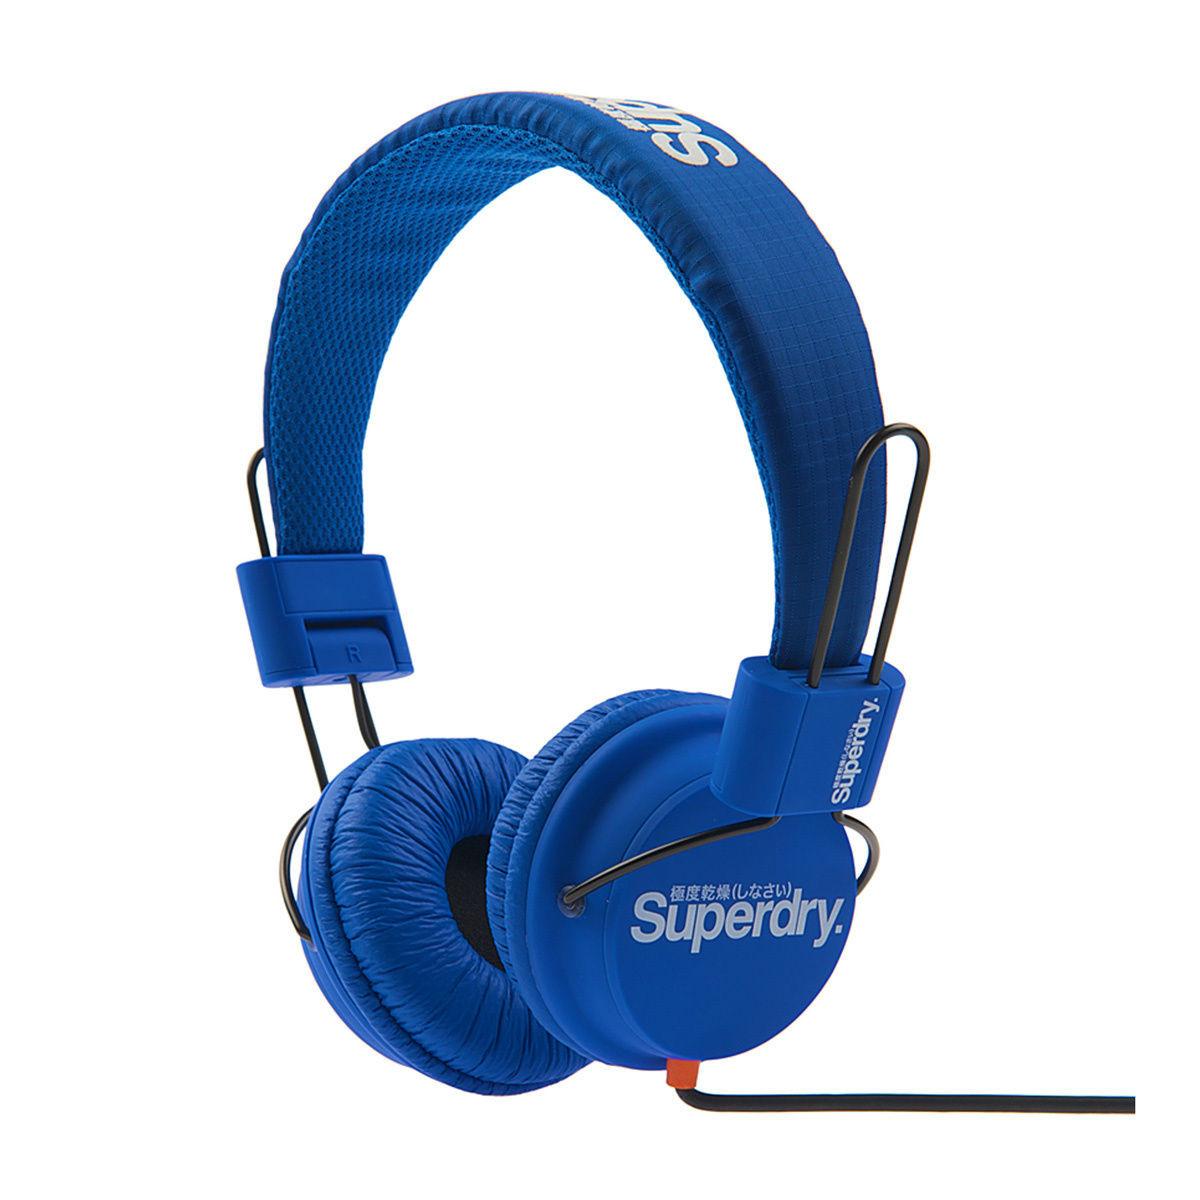 Technical Casque Audio Unisexe Superdry Bleu Pas Cher Casque Audio